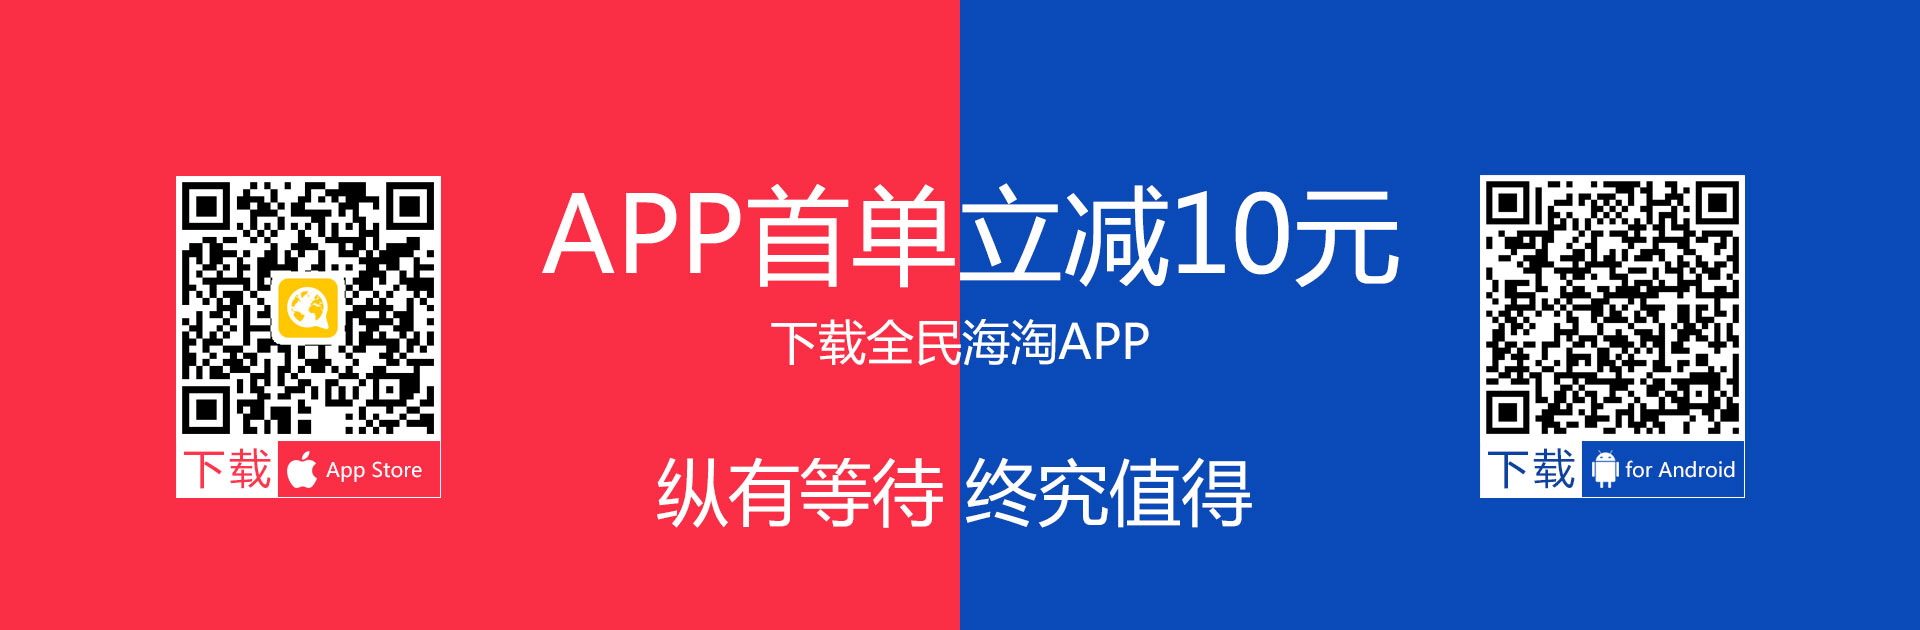 app上线通知